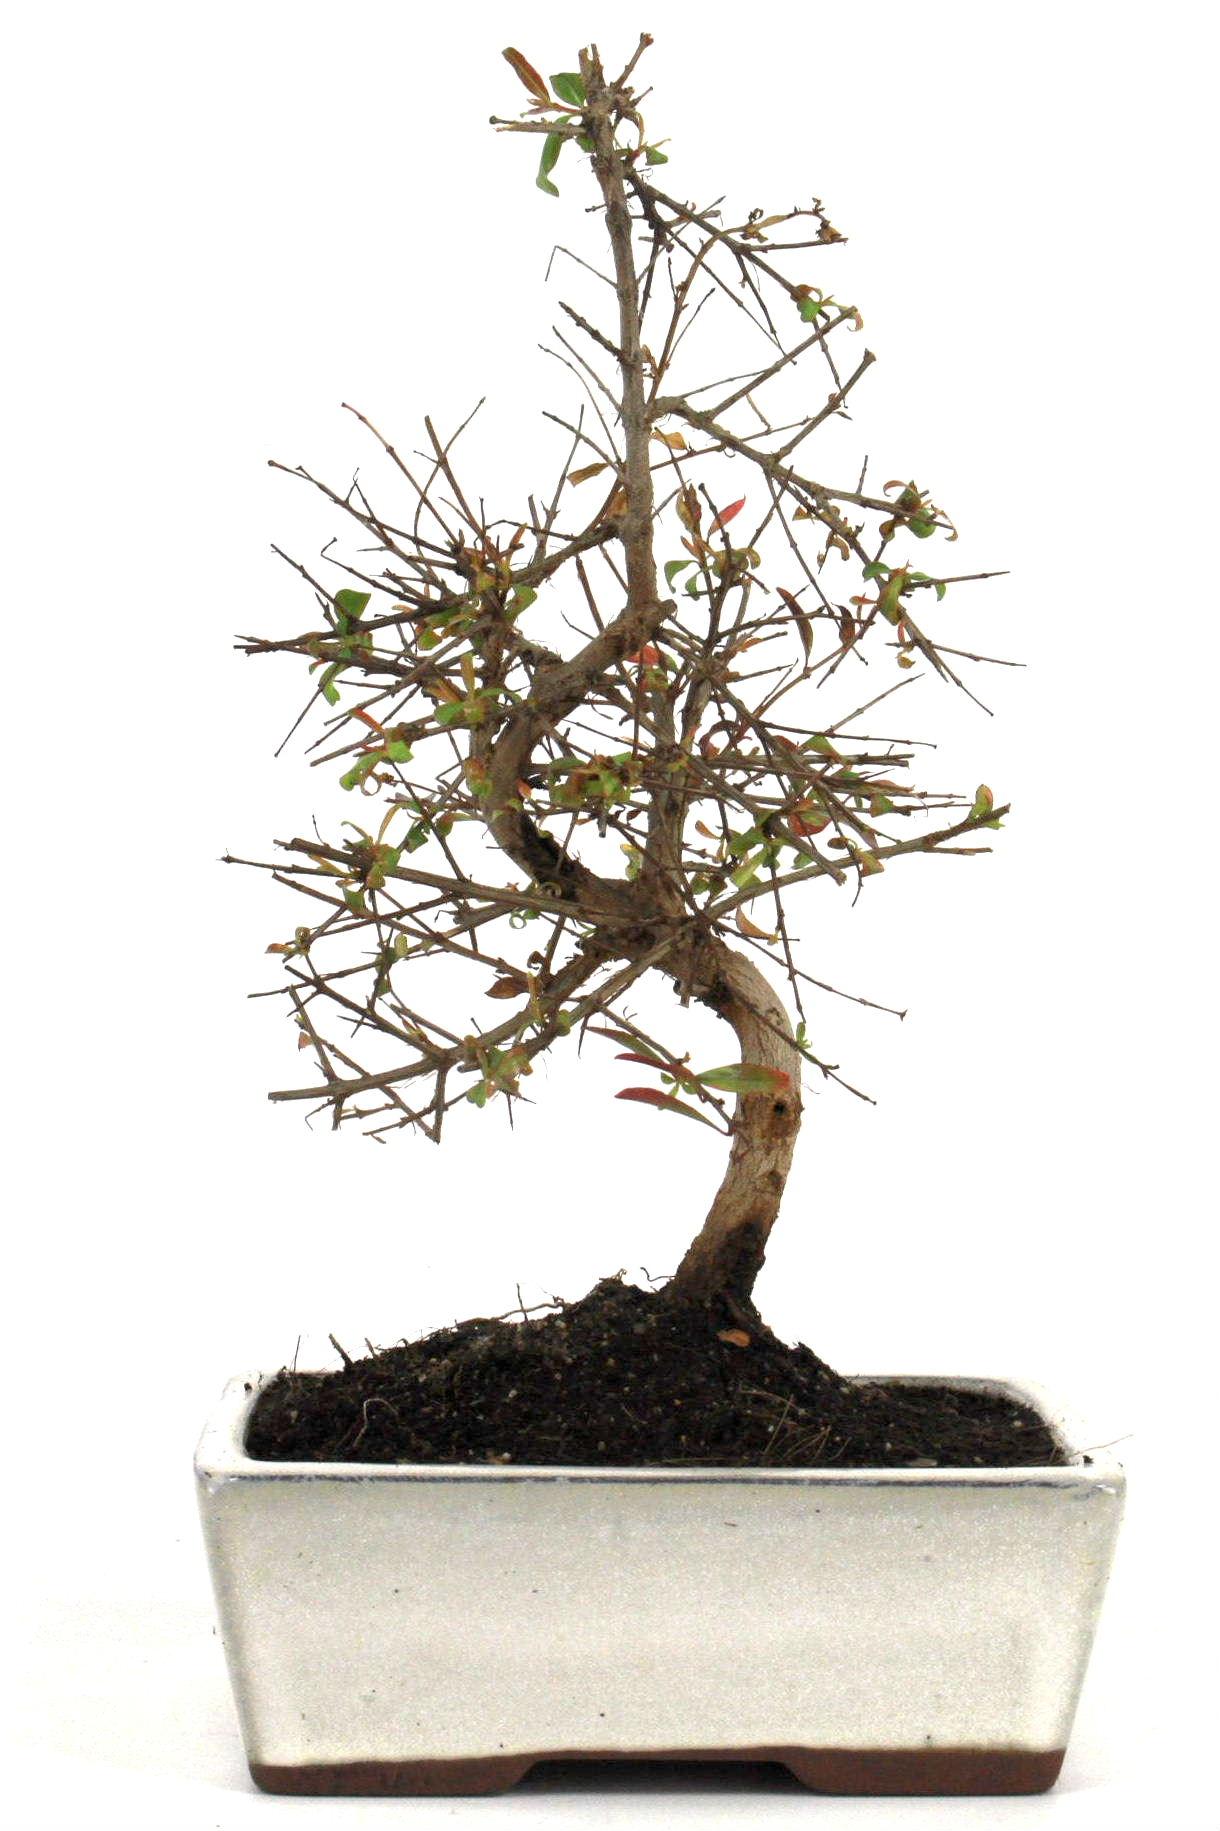 granatapfel bonsai 25 30 cm 168 bei oyaki bonsai kaufen. Black Bedroom Furniture Sets. Home Design Ideas